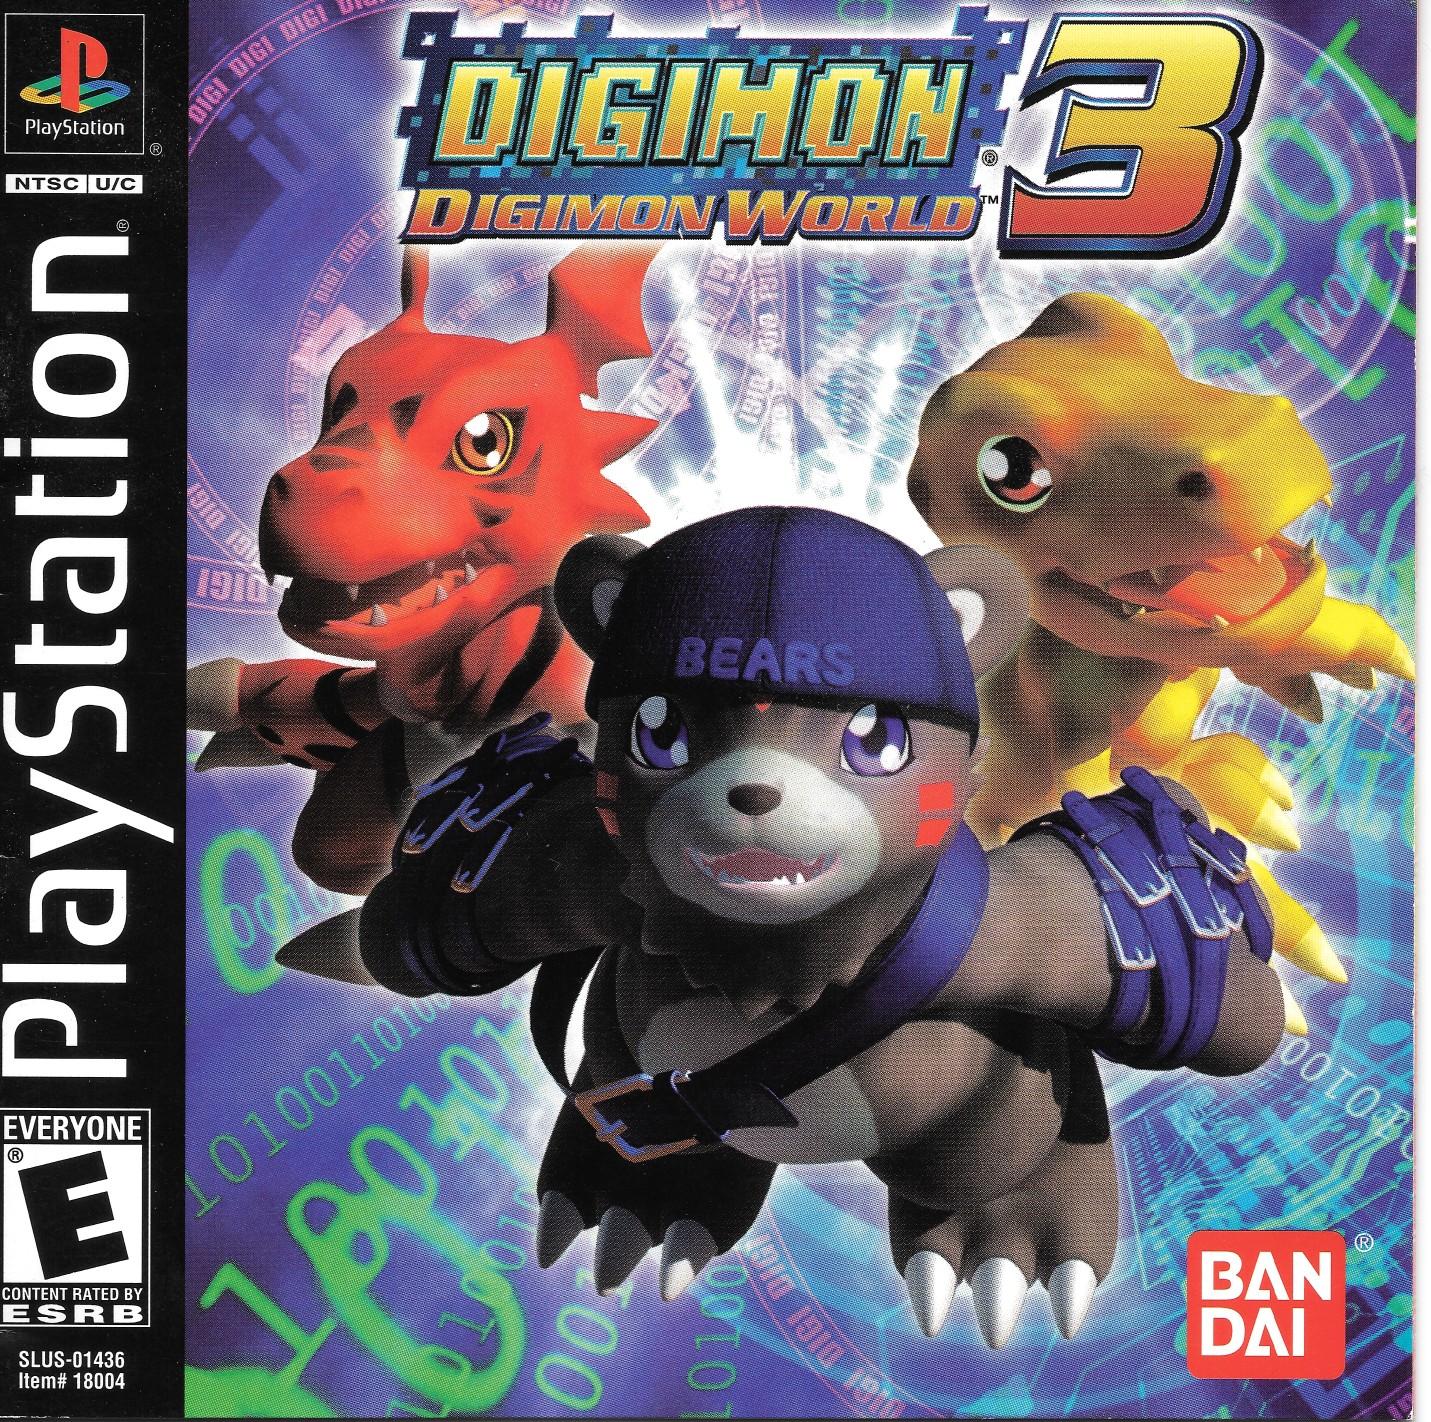 Digimon World Sles 02914 Rom Playstation Ps1 Emulator Games